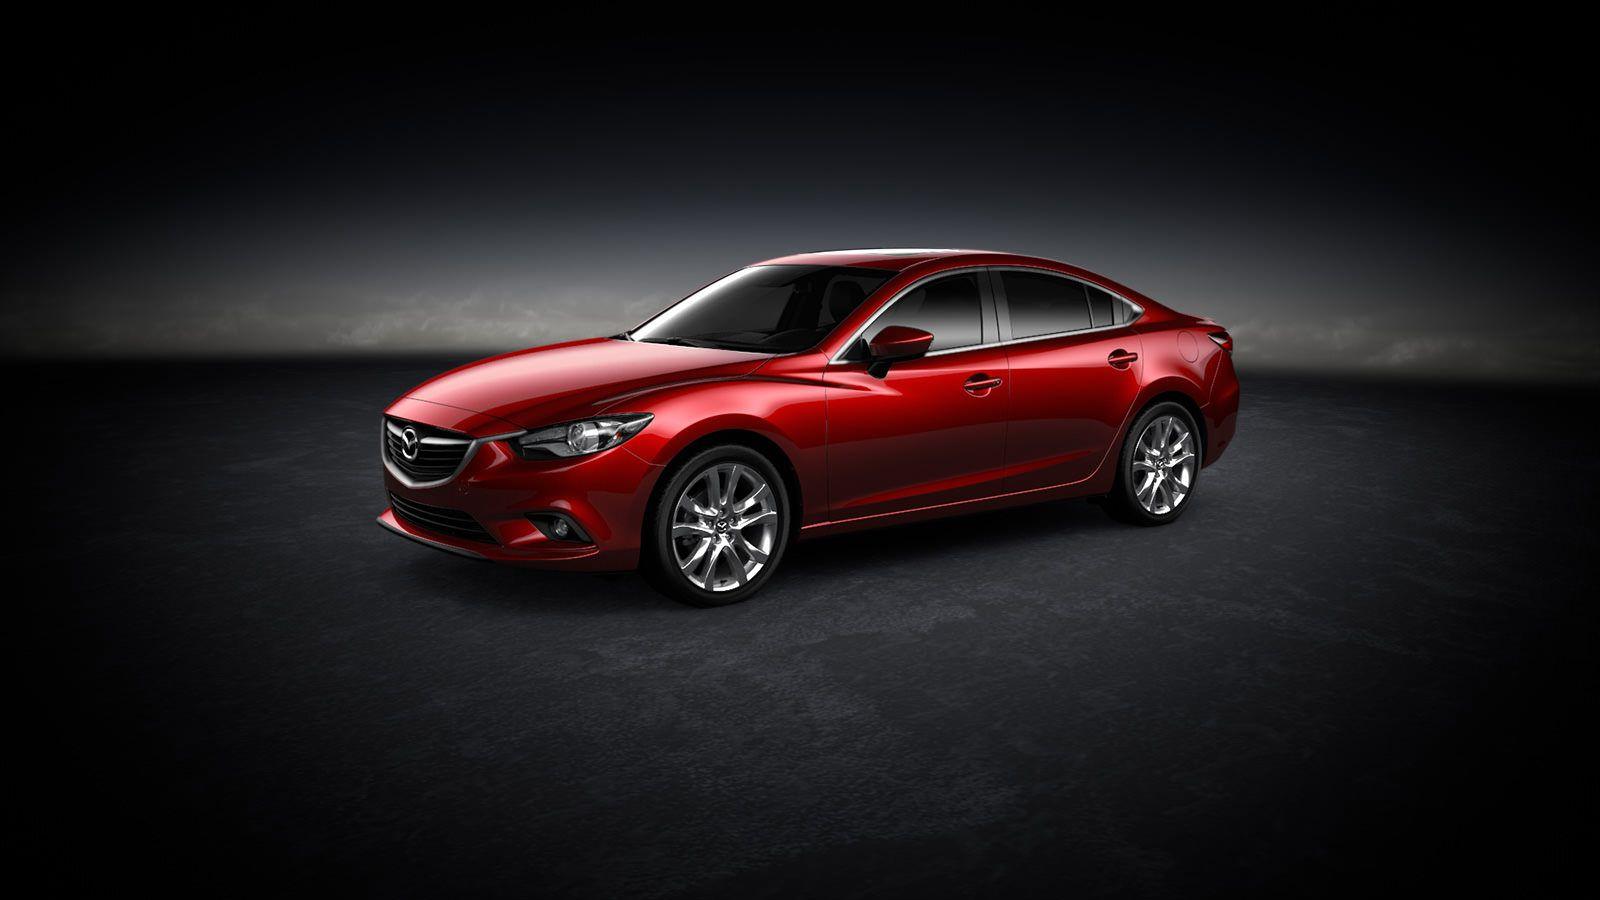 2015 Mazda Atenza Full HD Wallpaper